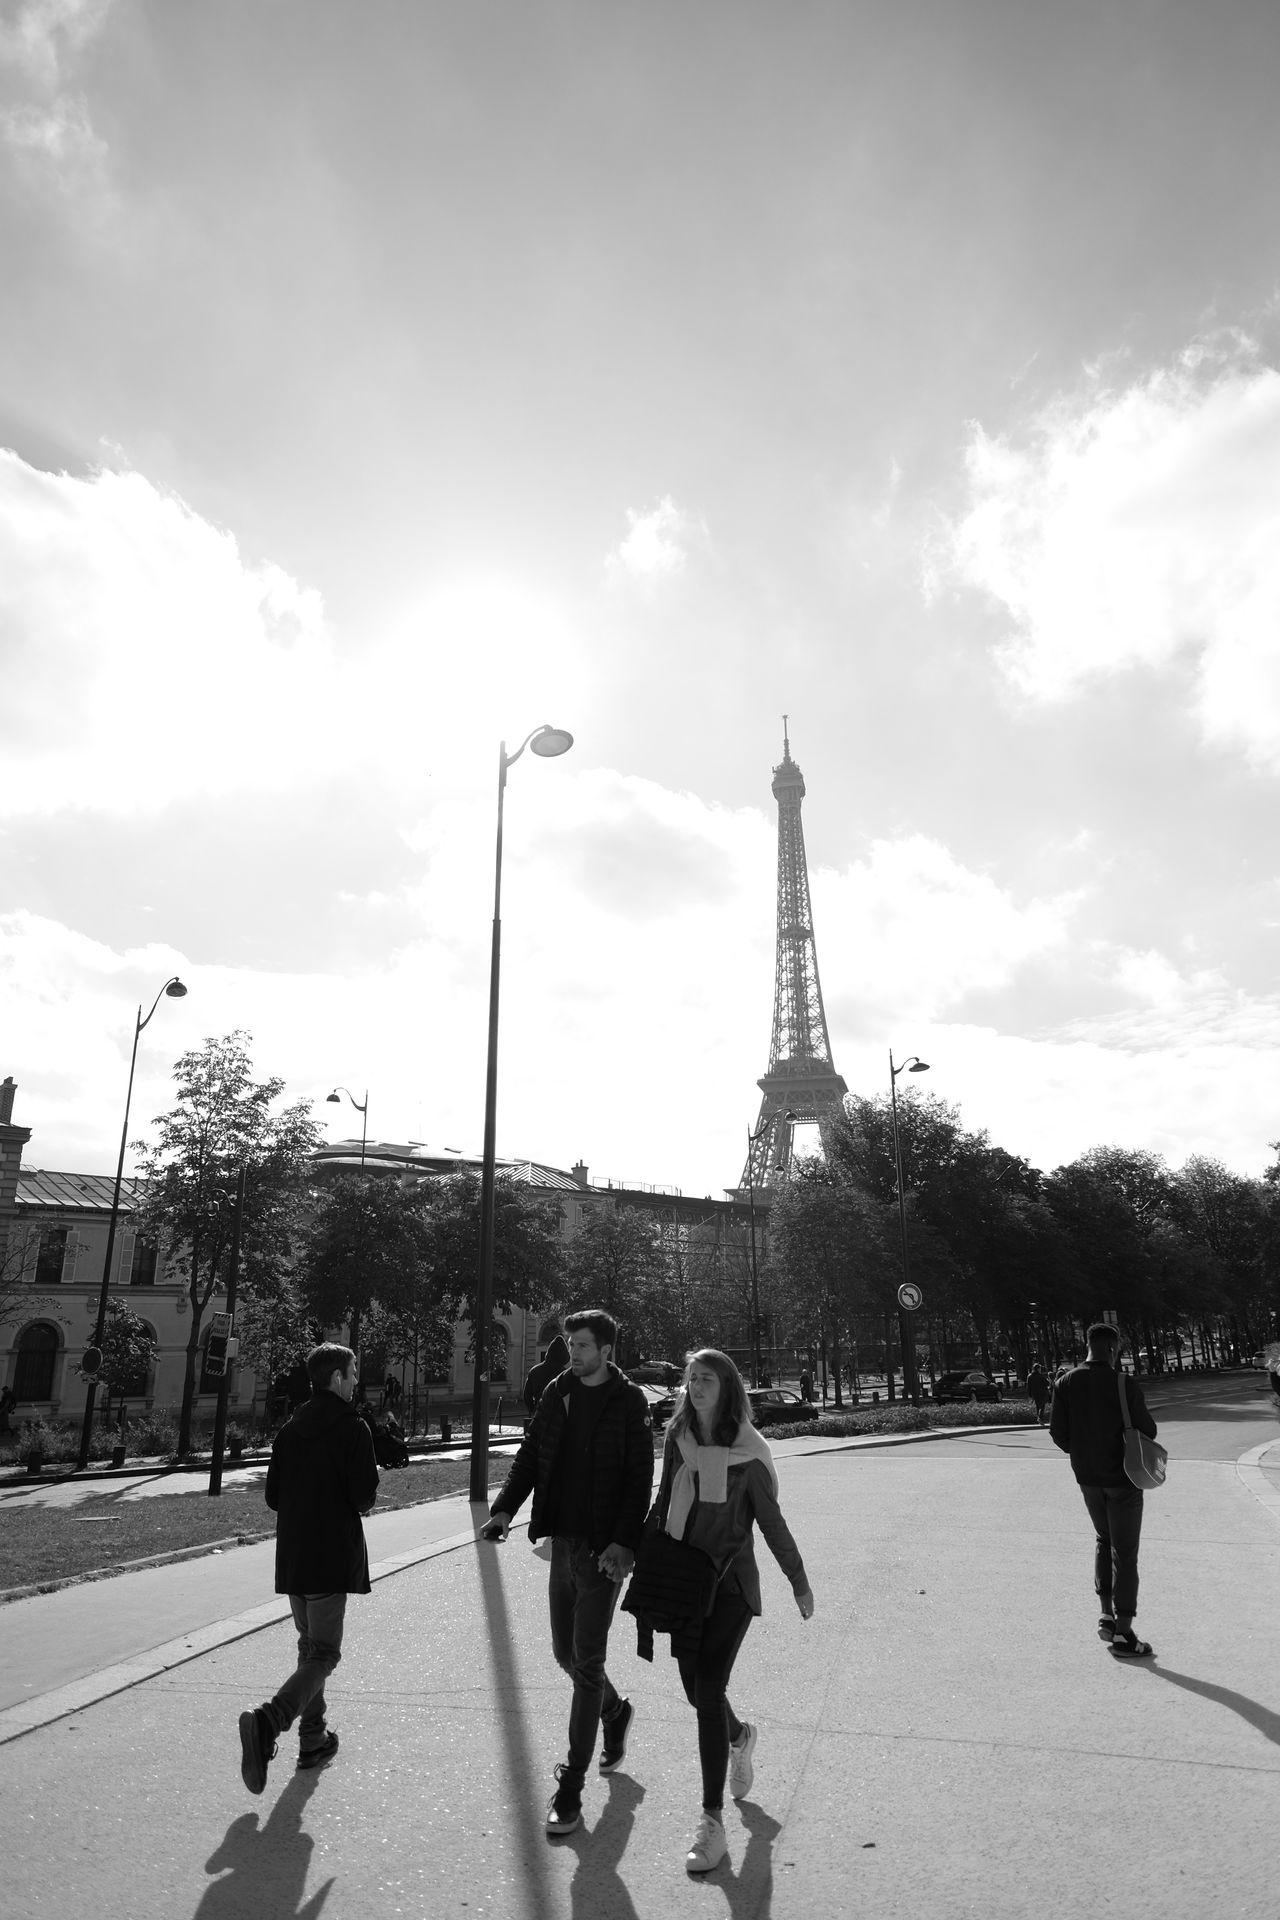 Paris Eiffel Tower Blackandwhite Architecture Street Photography Fuji X-T1